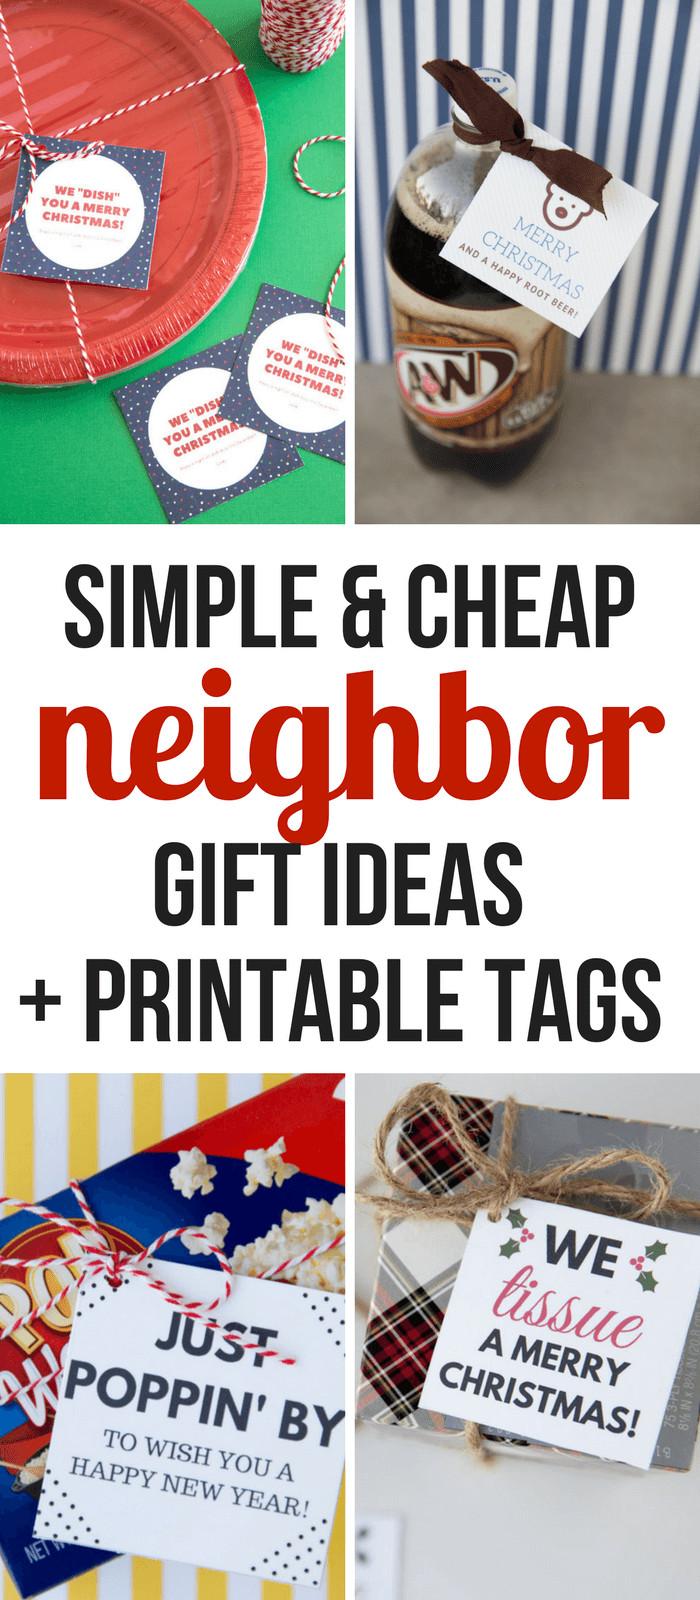 Holiday Gift Ideas For Neighbors  10 Inexpensive & Simple Christmas Neighbor Gift Ideas So